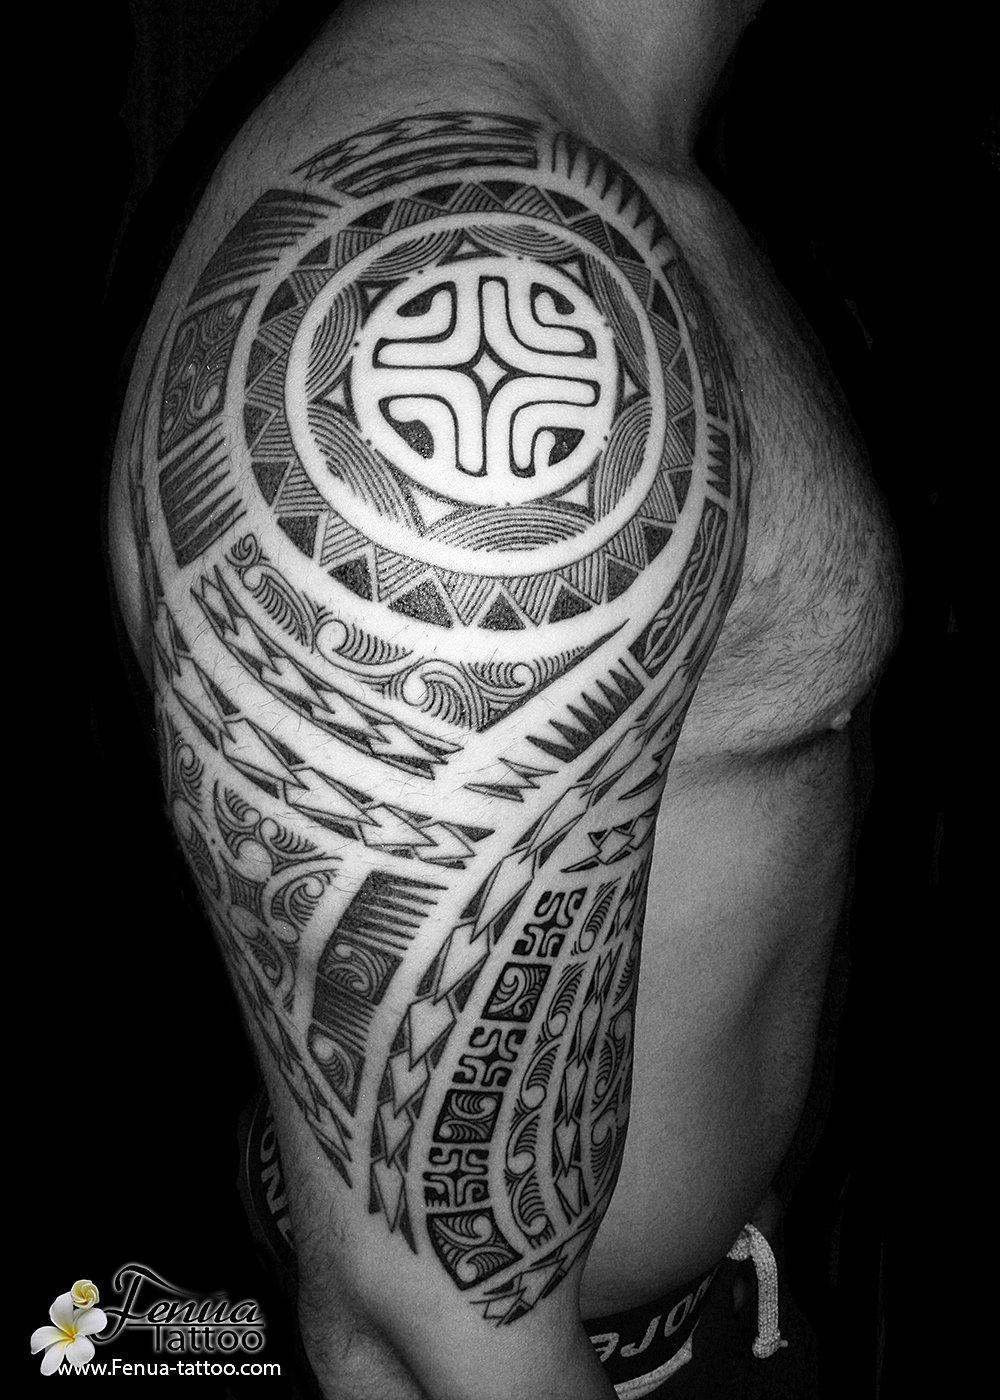 tatouage polynesien by pierre martinez de tahiti tattoo sanary mer tatouage polynesien maorie. Black Bedroom Furniture Sets. Home Design Ideas